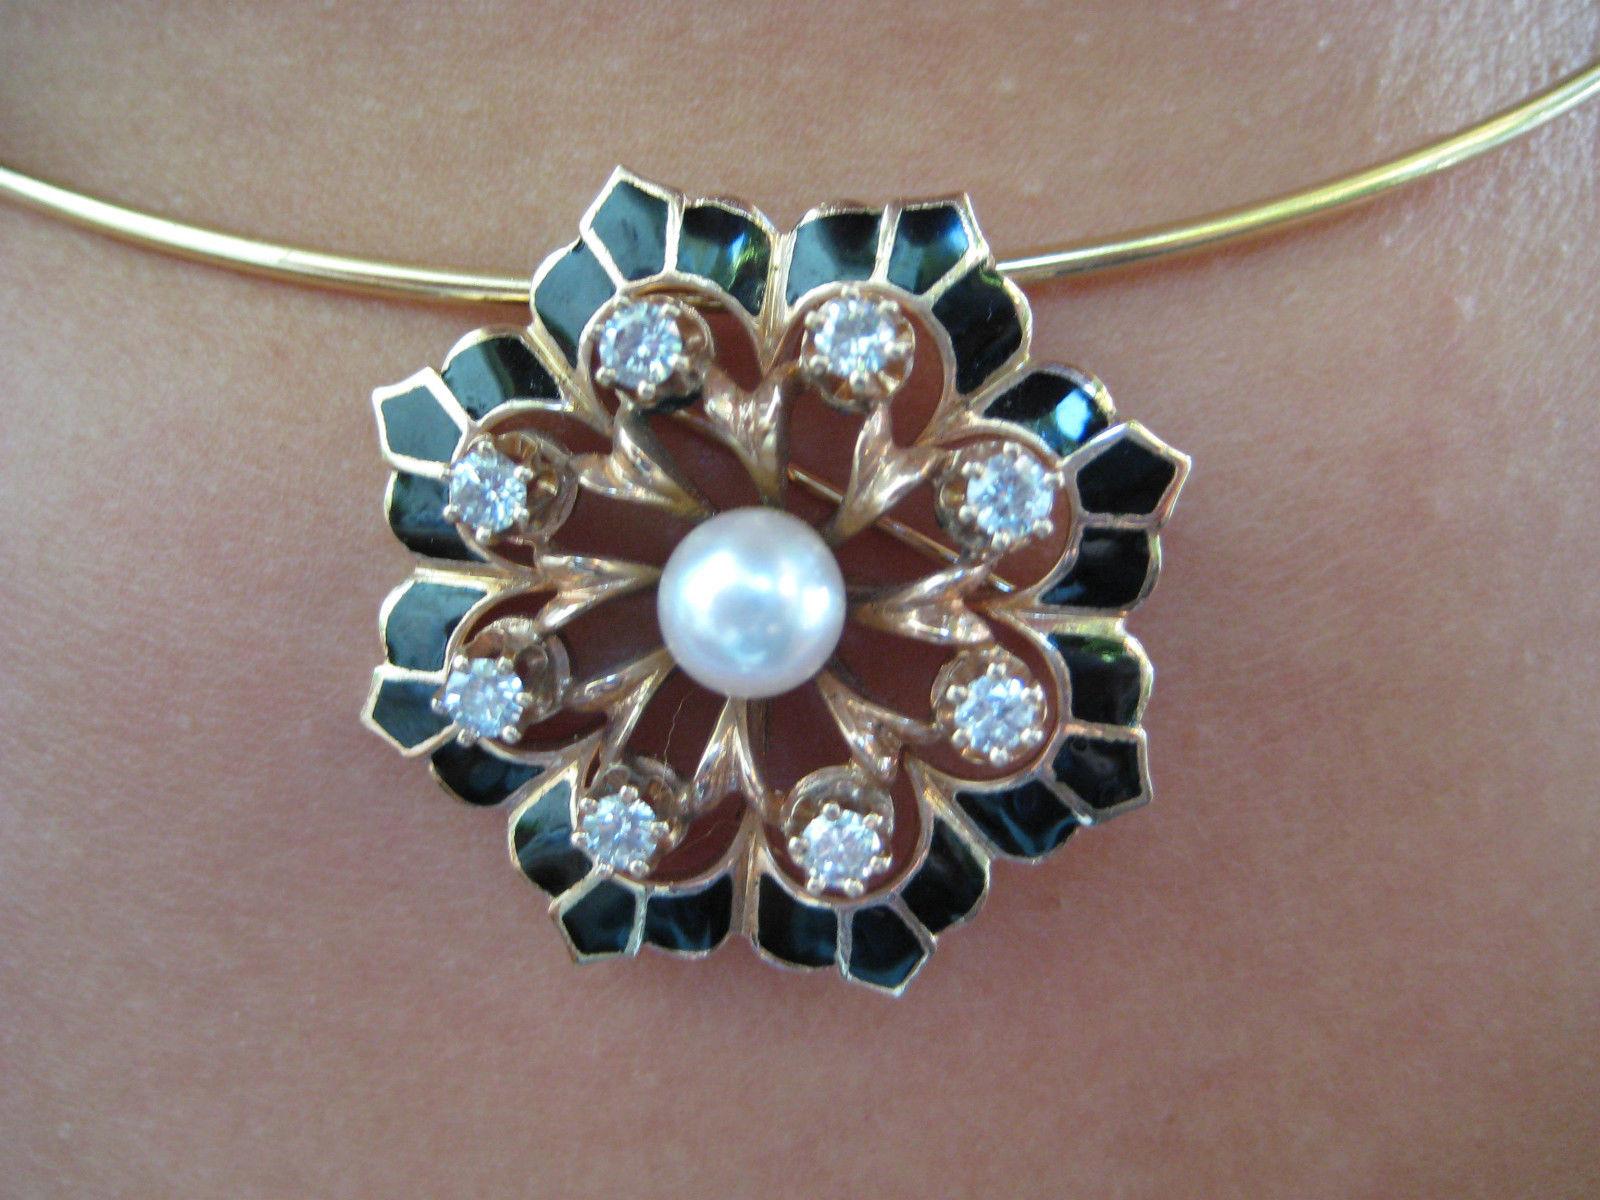 Antique jewelry in diamonds, gold, platinum and various precious gems.